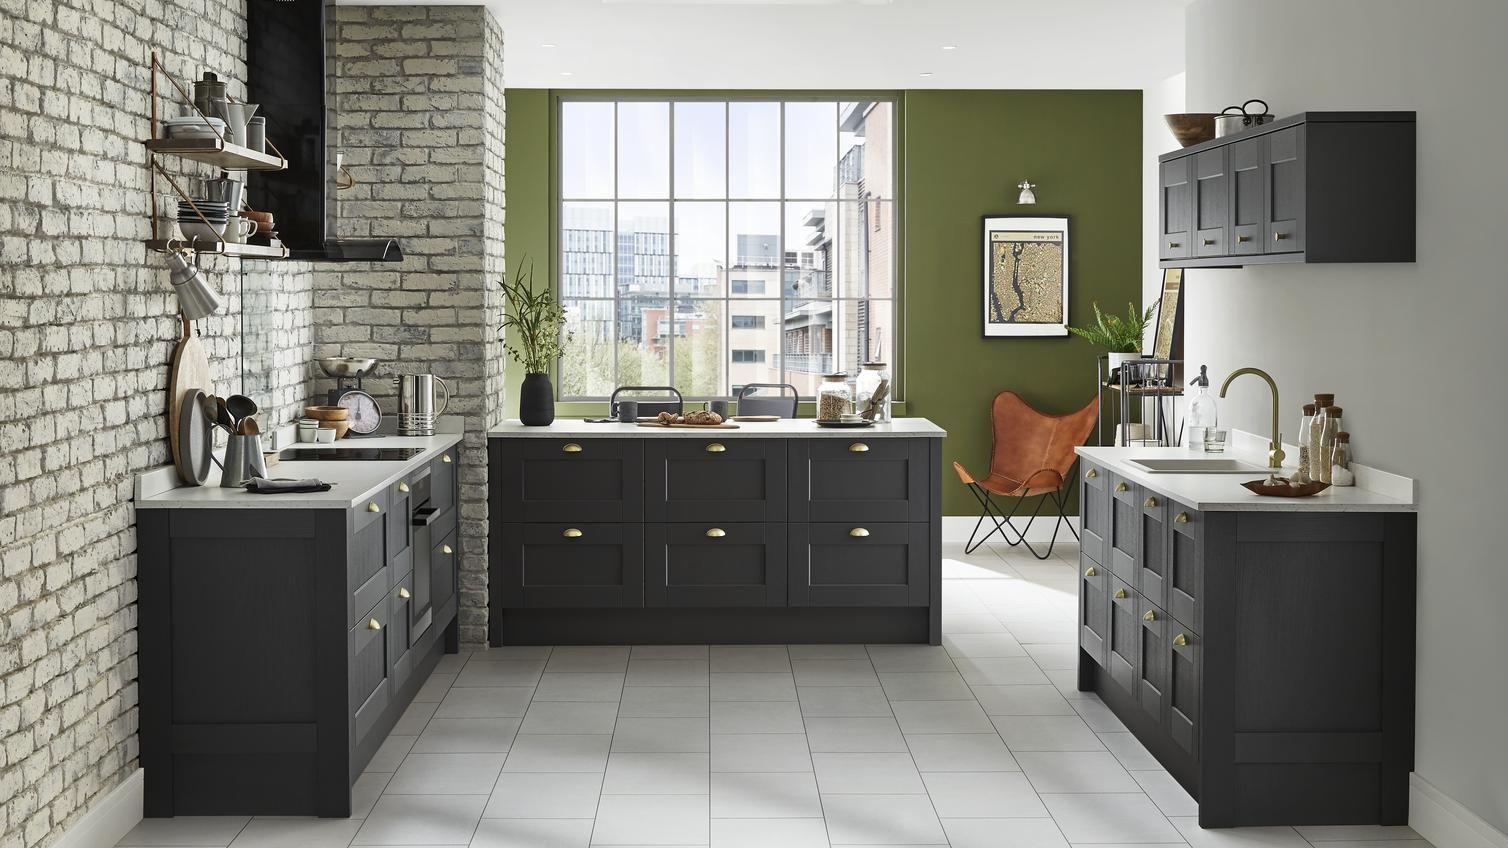 Shaker Kitchen Ideas Shaker kitchen, Kitchen design